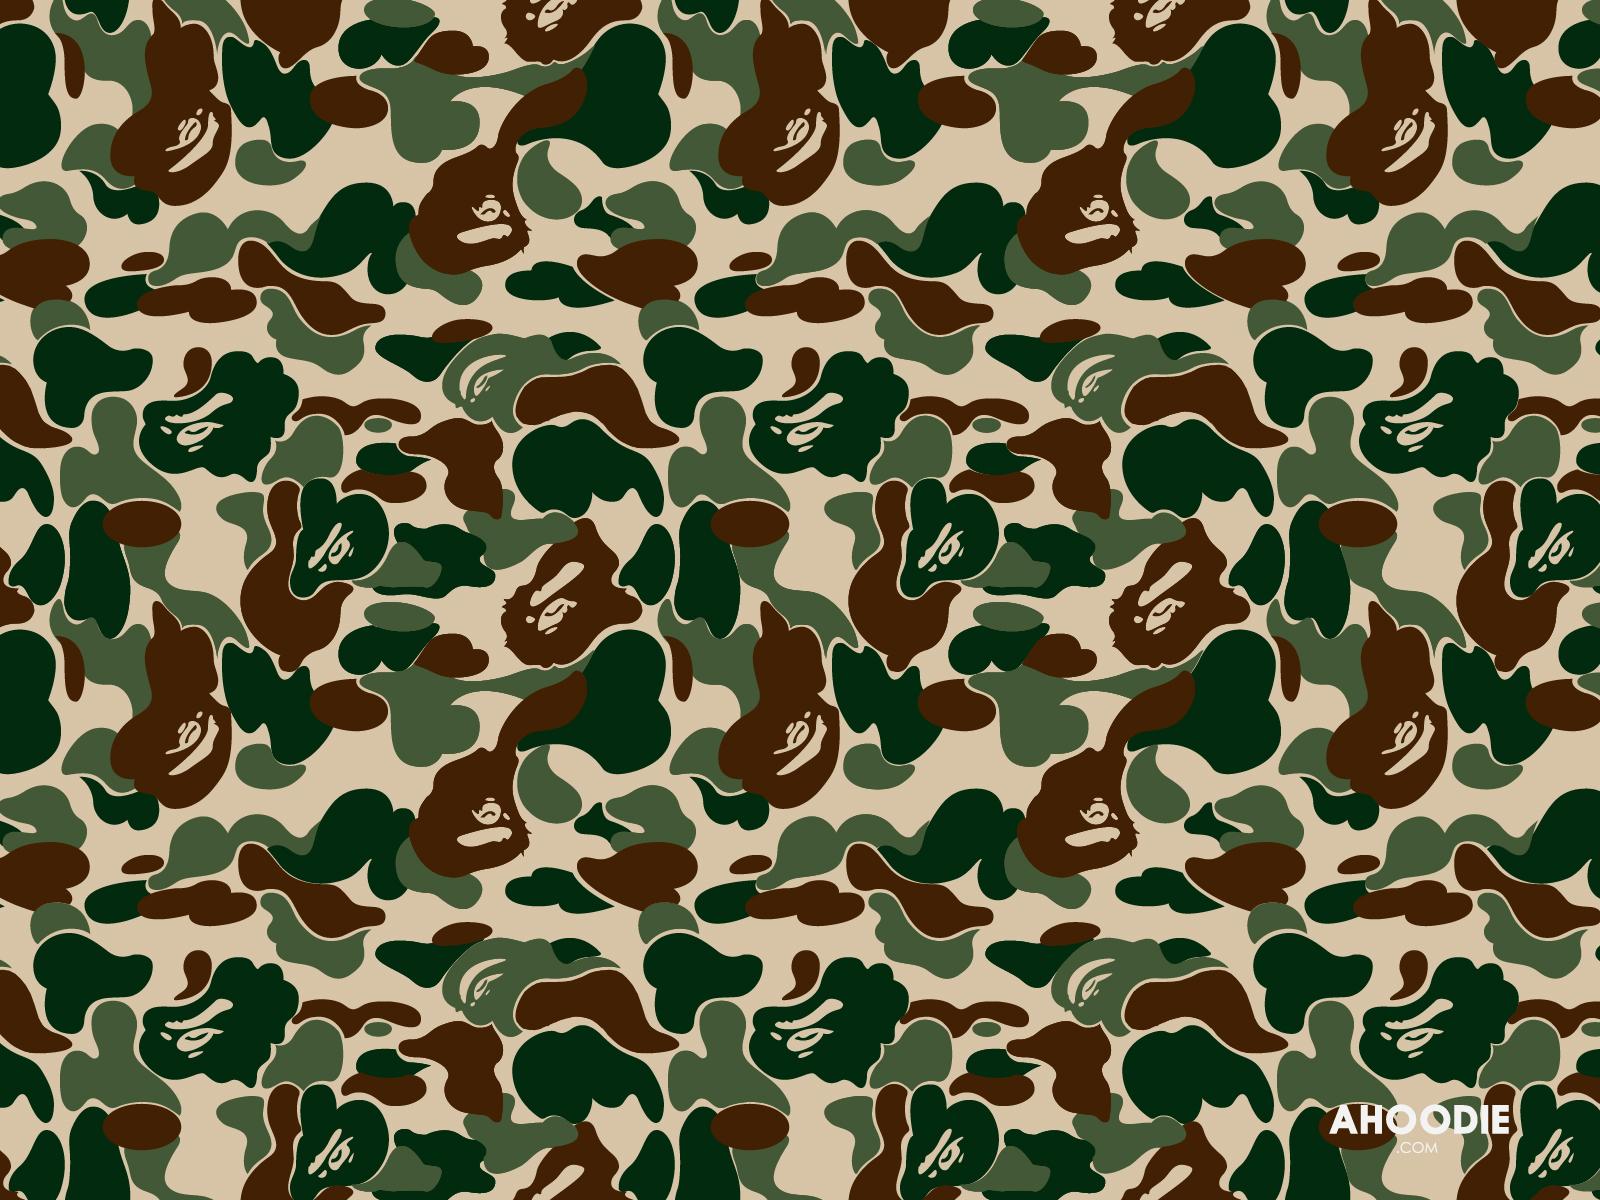 bape camo wallpaper desktop green   Brotherhood Mag 1600x1200